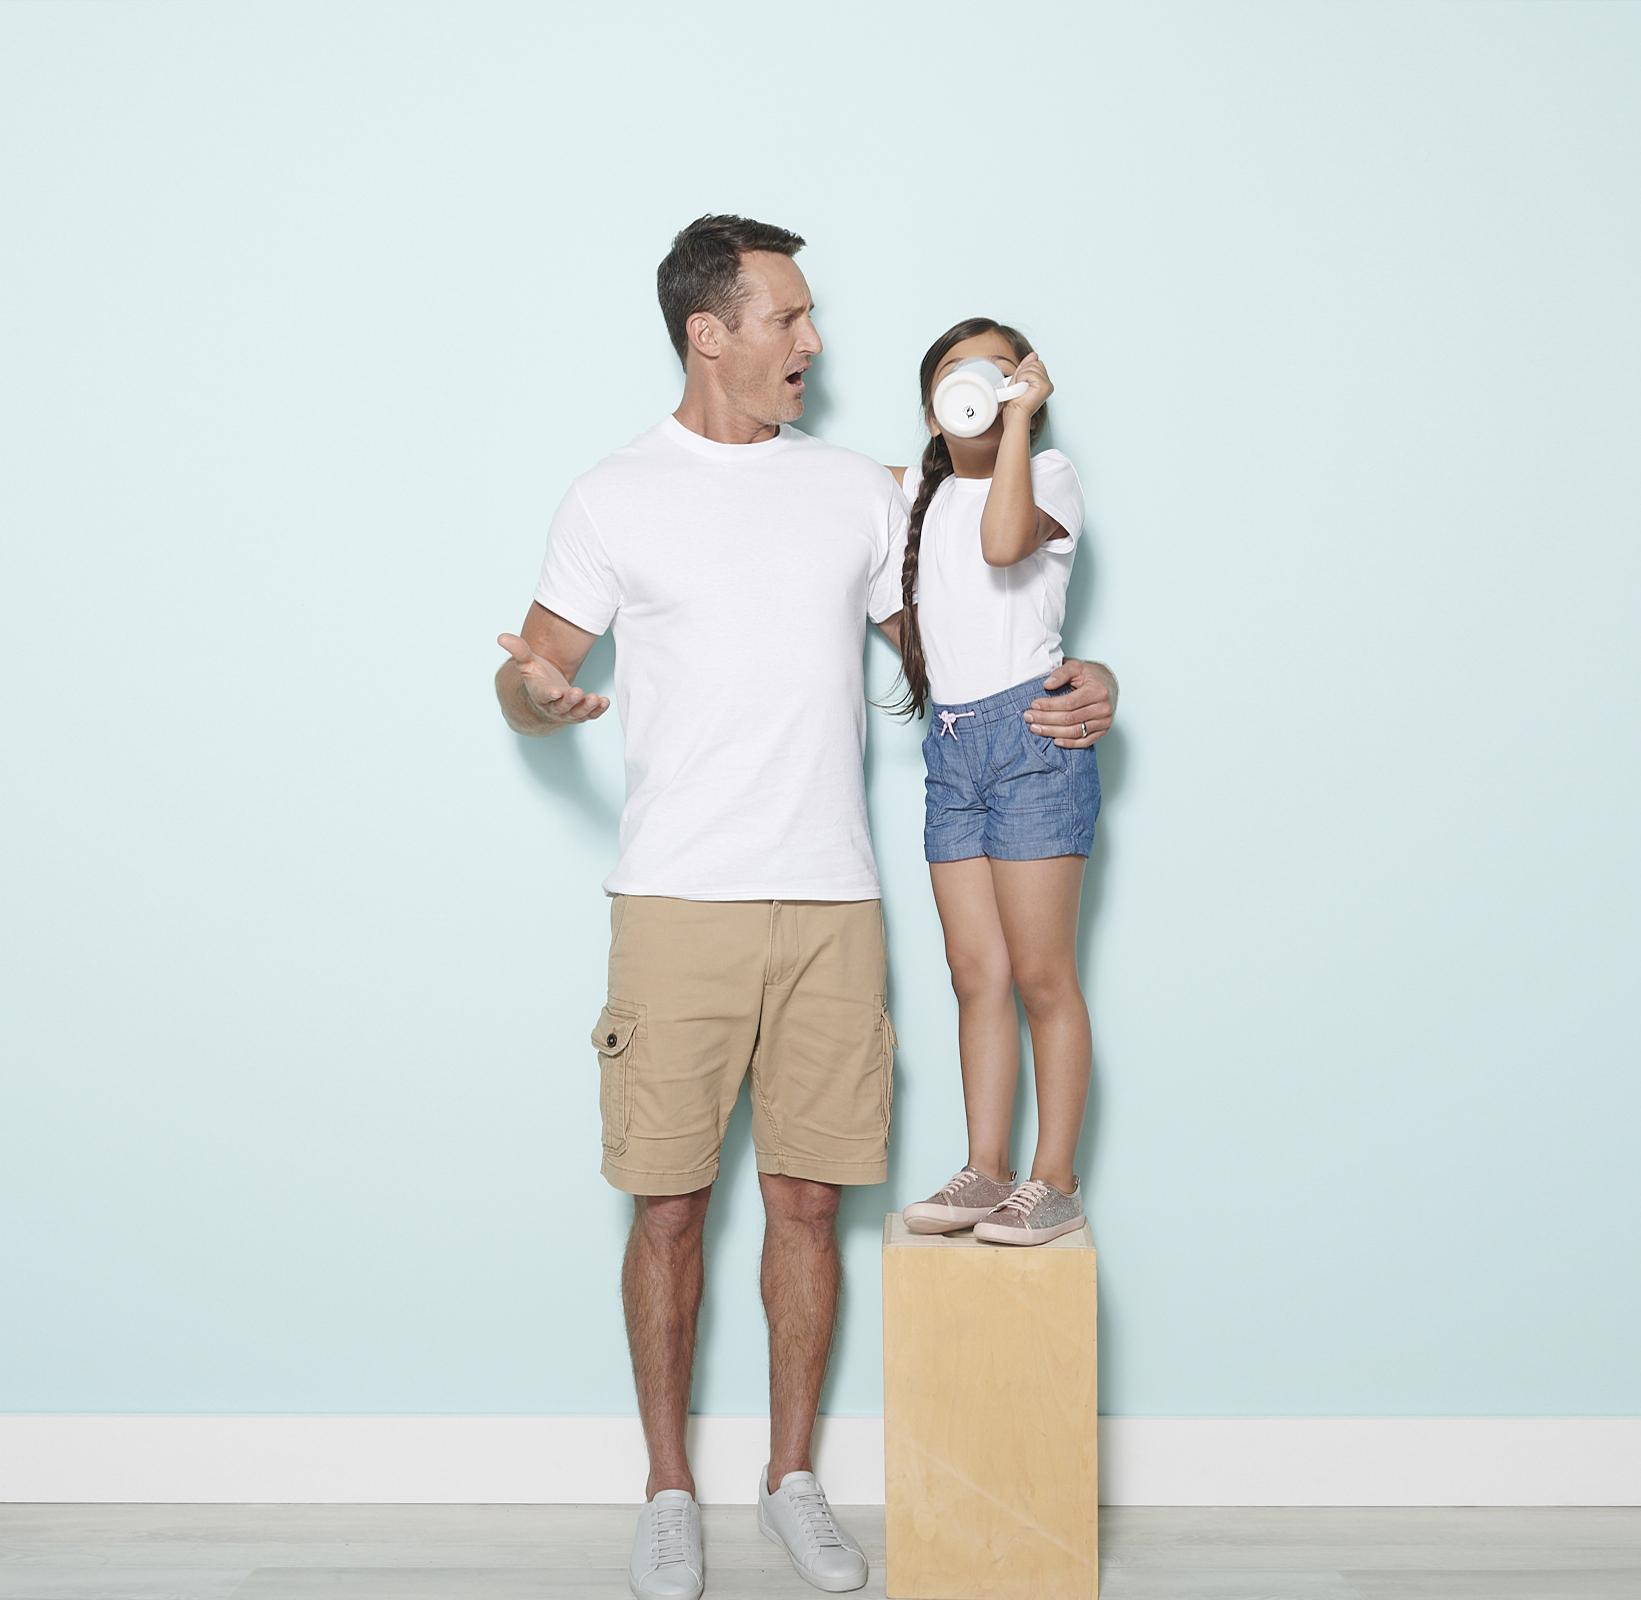 Basic_Shirts_Fathers_Day_Zara_Simon_Blue_Wall_0879_WEB.jpg